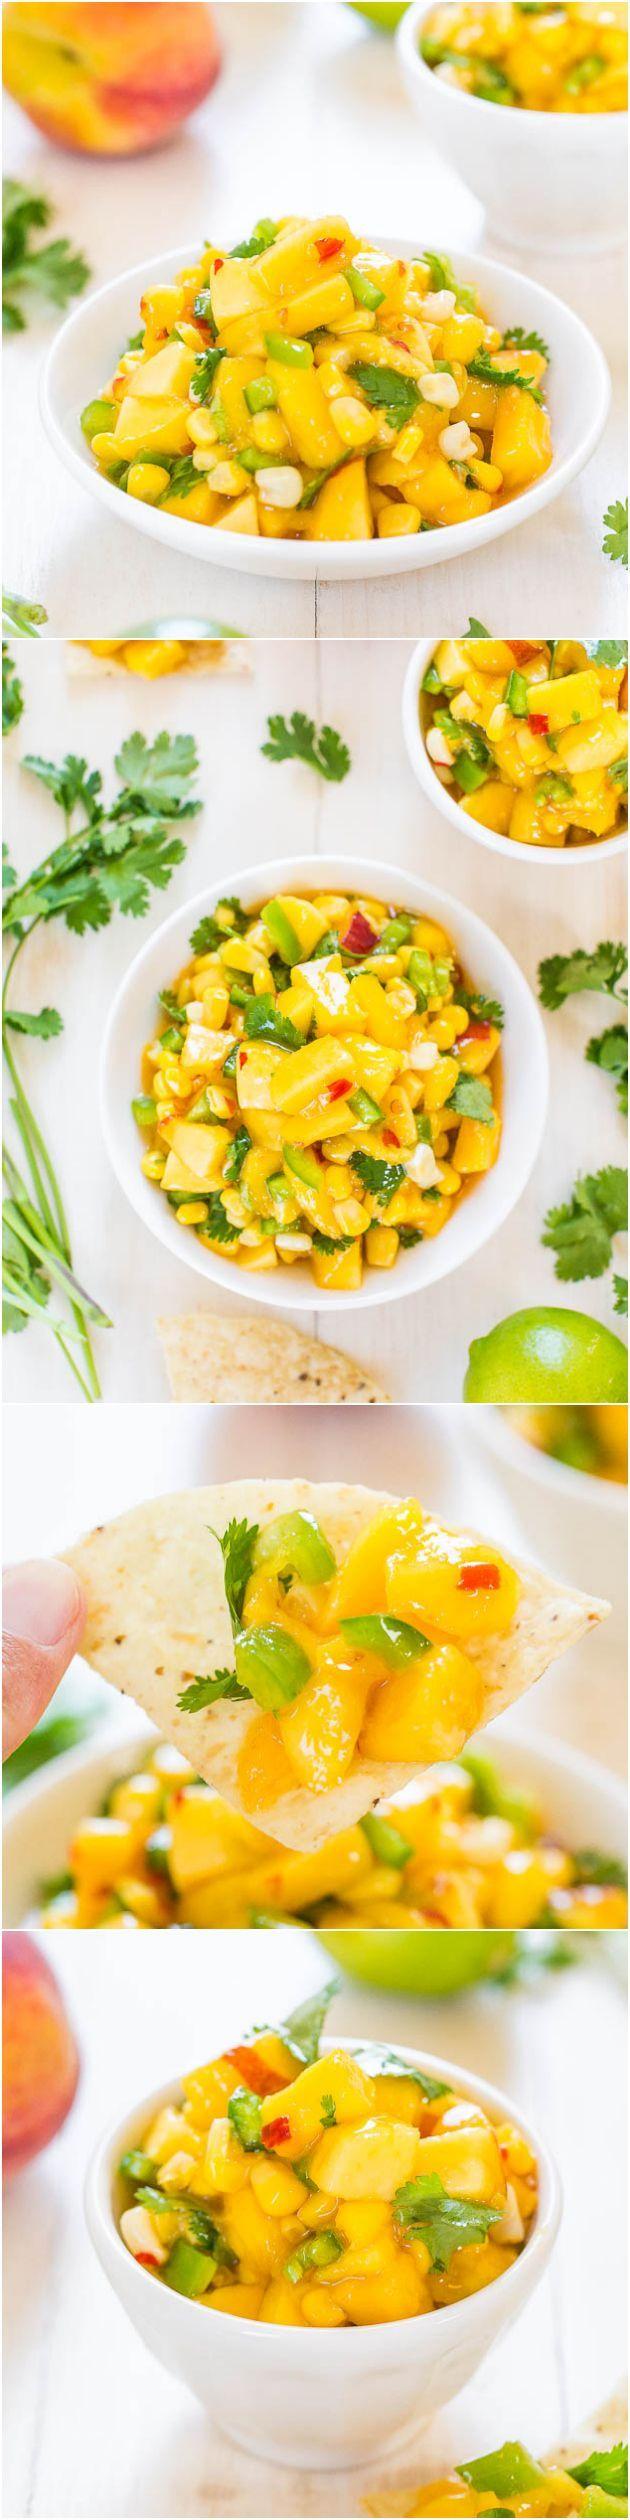 The Best Peach Mango Salsa (vegan, GF) - Fast, easy, and tastes a million times better than anything storebought! So.darn.good!!